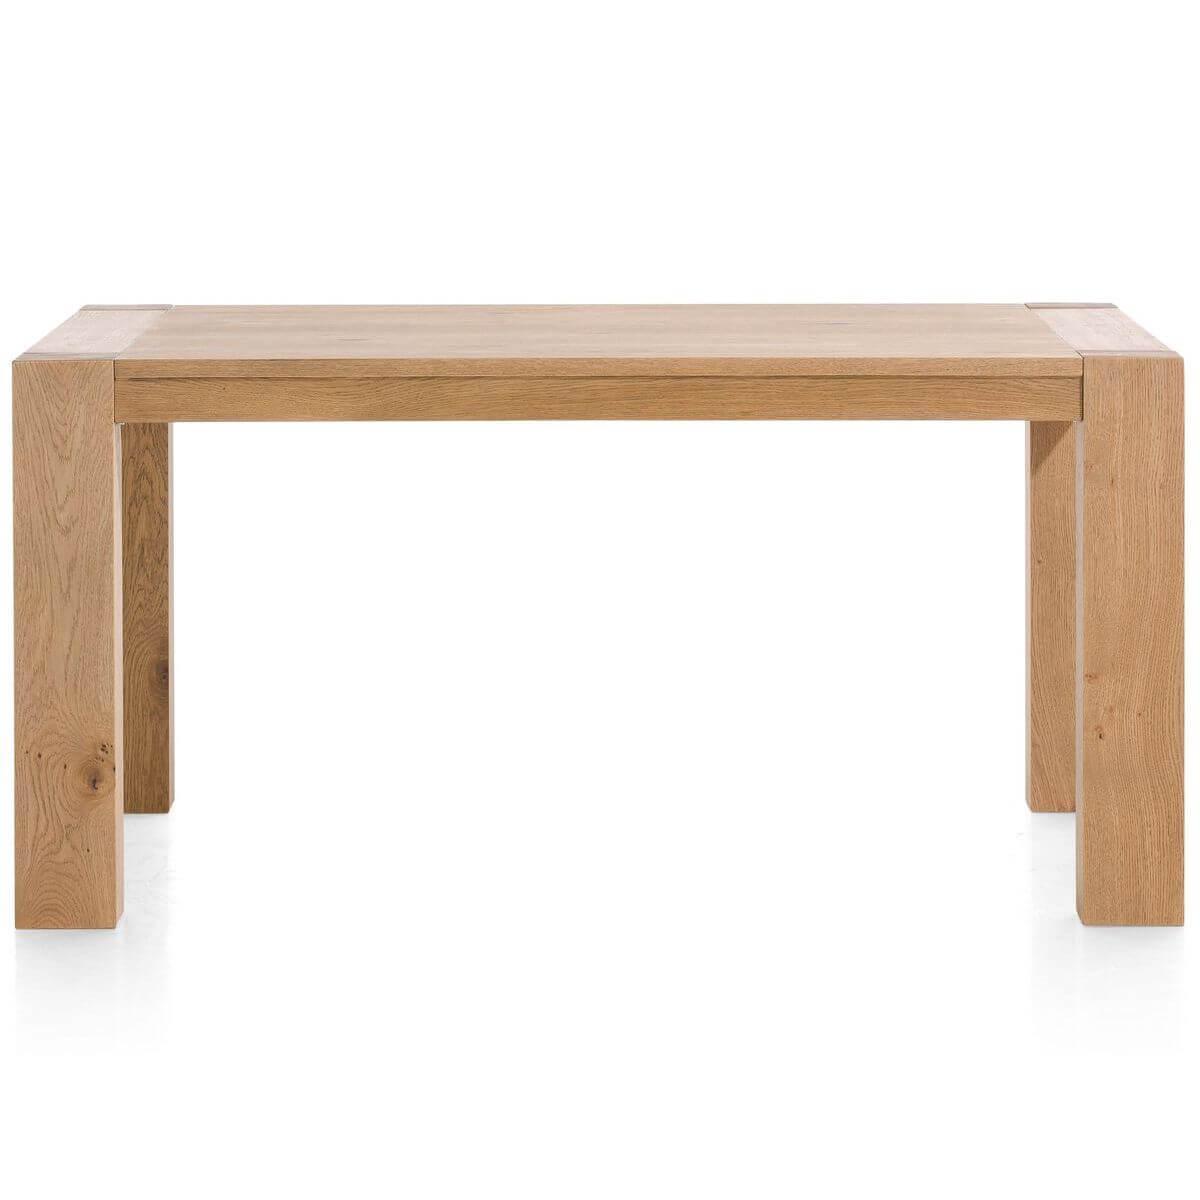 Table 160x90cm SANTORINI HetH castle-white